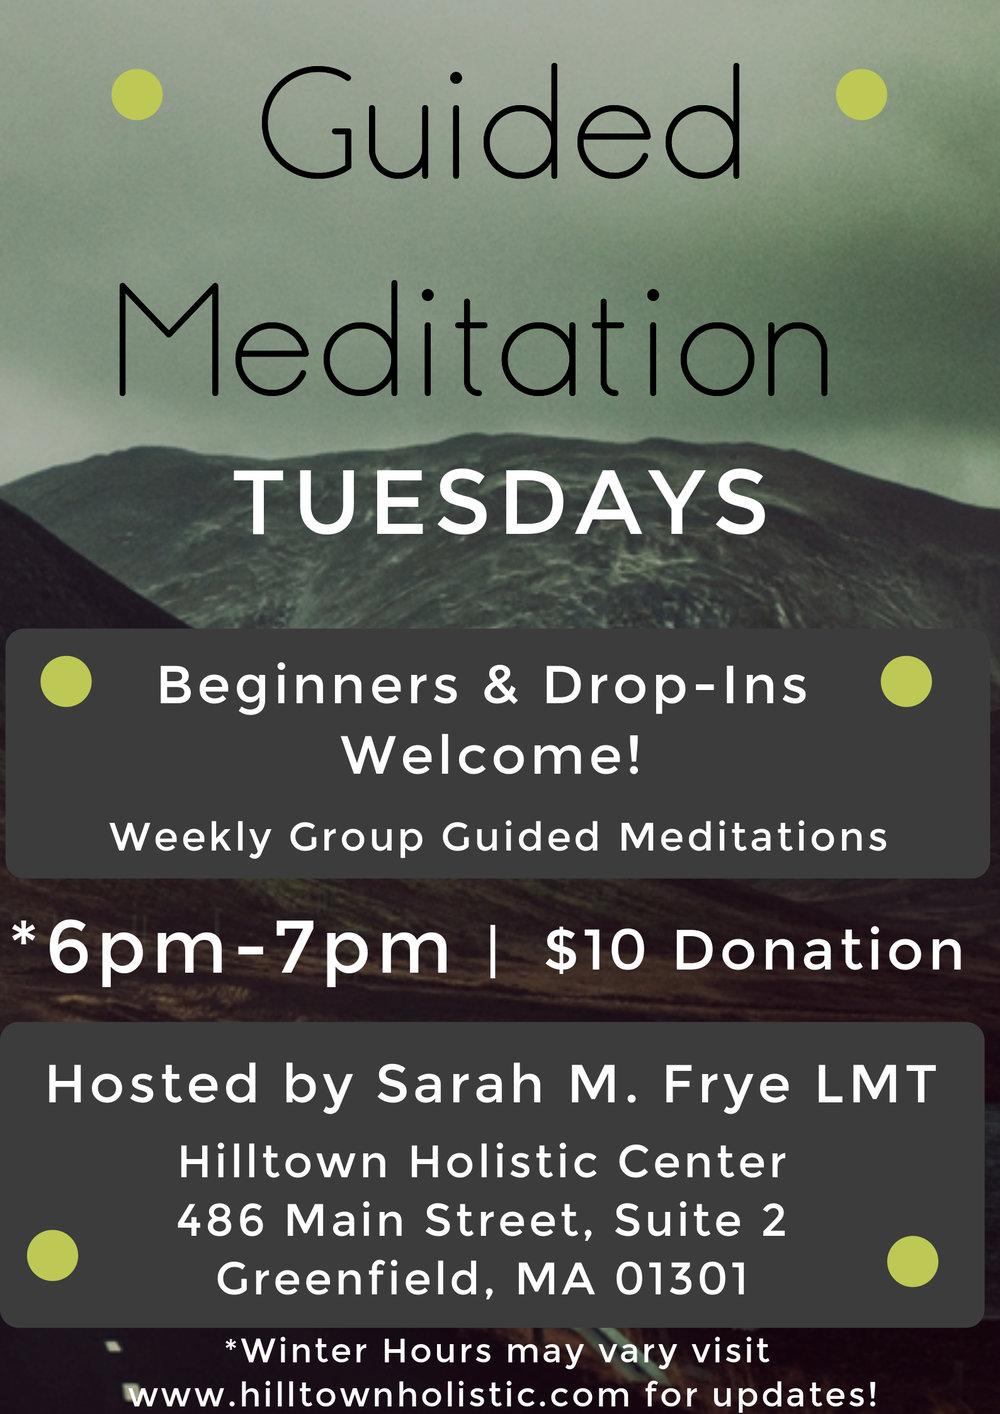 Guided Meditation Tuesdays.jpg